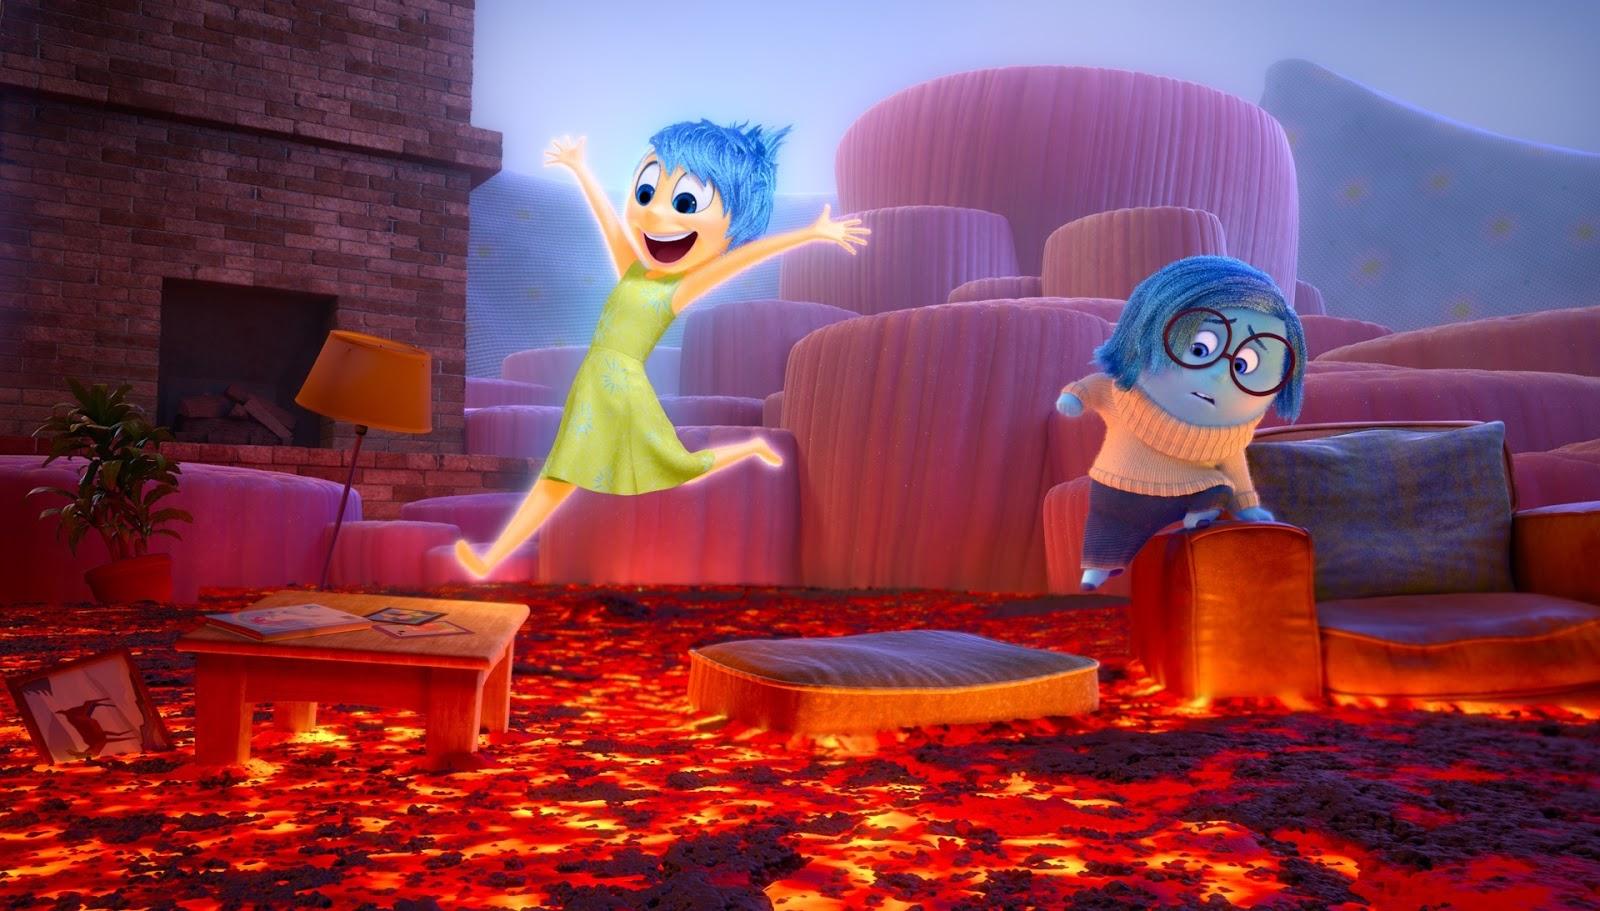 AnimateFun 艾樂莓特: 皮克斯年度動畫片!!8/7即將登場!腦筋急轉彎(Inside Out)誰!?是誰在控制我的喜怒哀樂!!